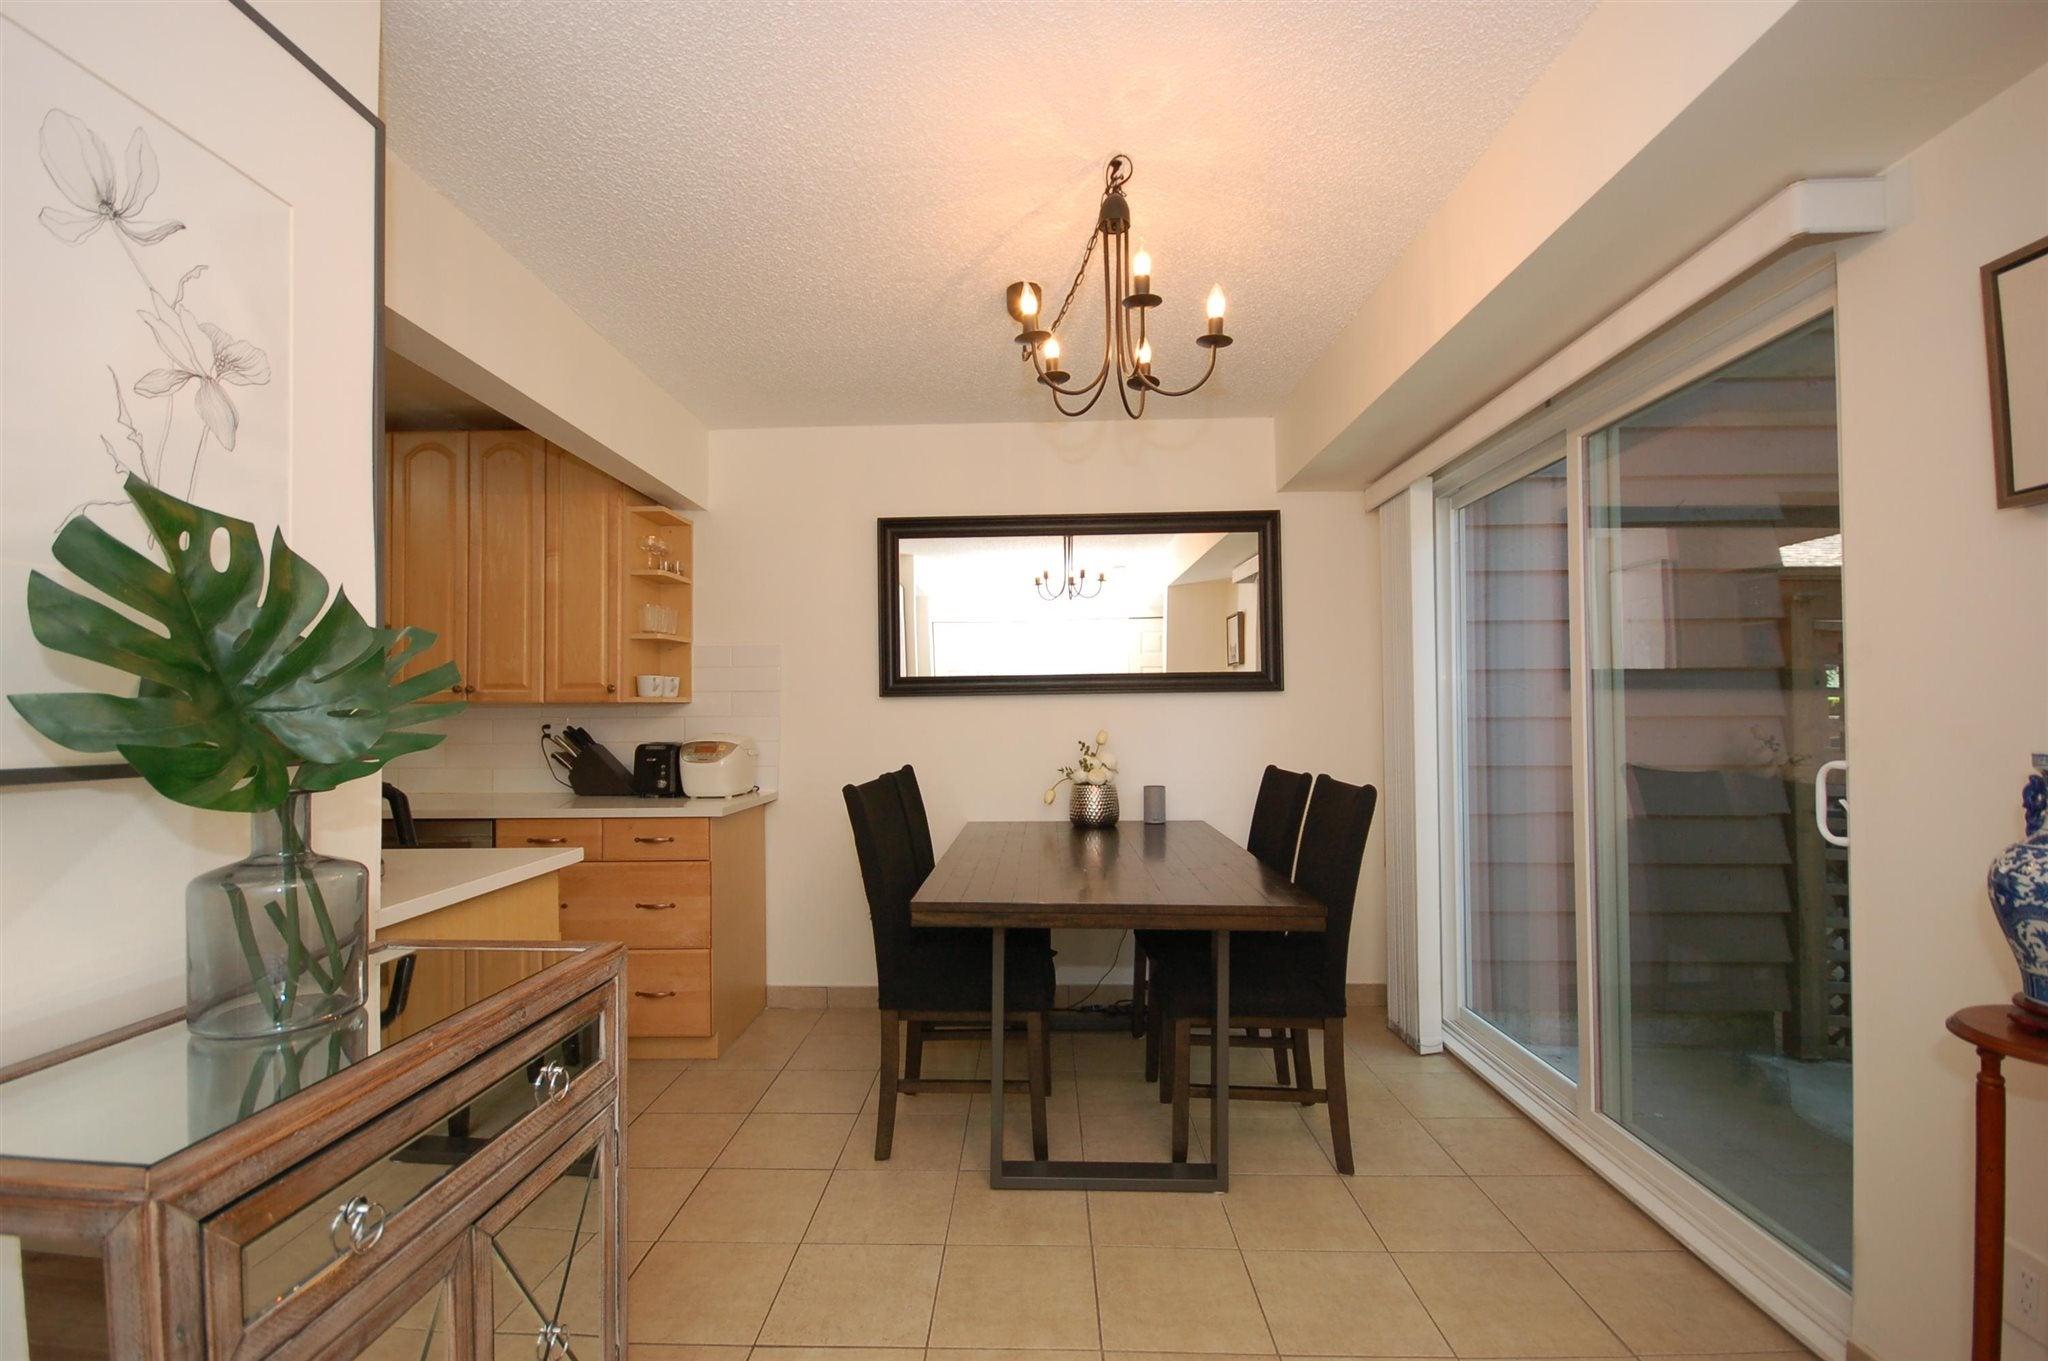 34 1140 EAGLERIDGE DRIVE - Eagle Ridge CQ Townhouse for sale, 3 Bedrooms (R2605853)